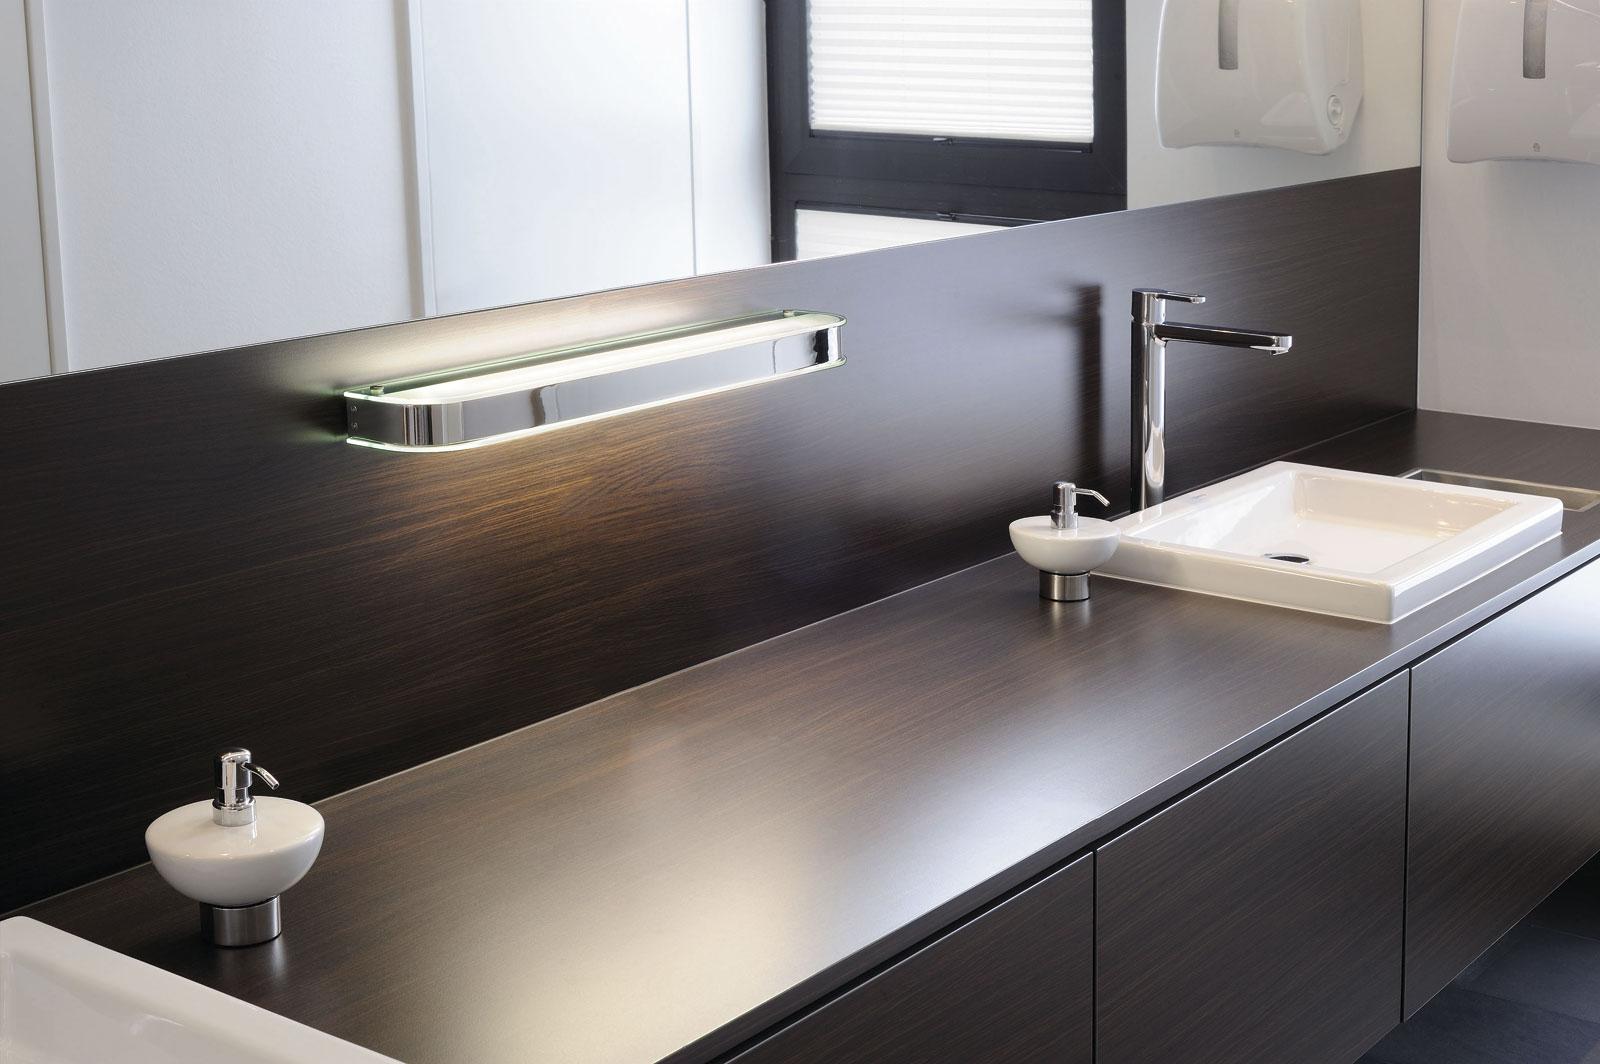 luminaire pour salle de bain design